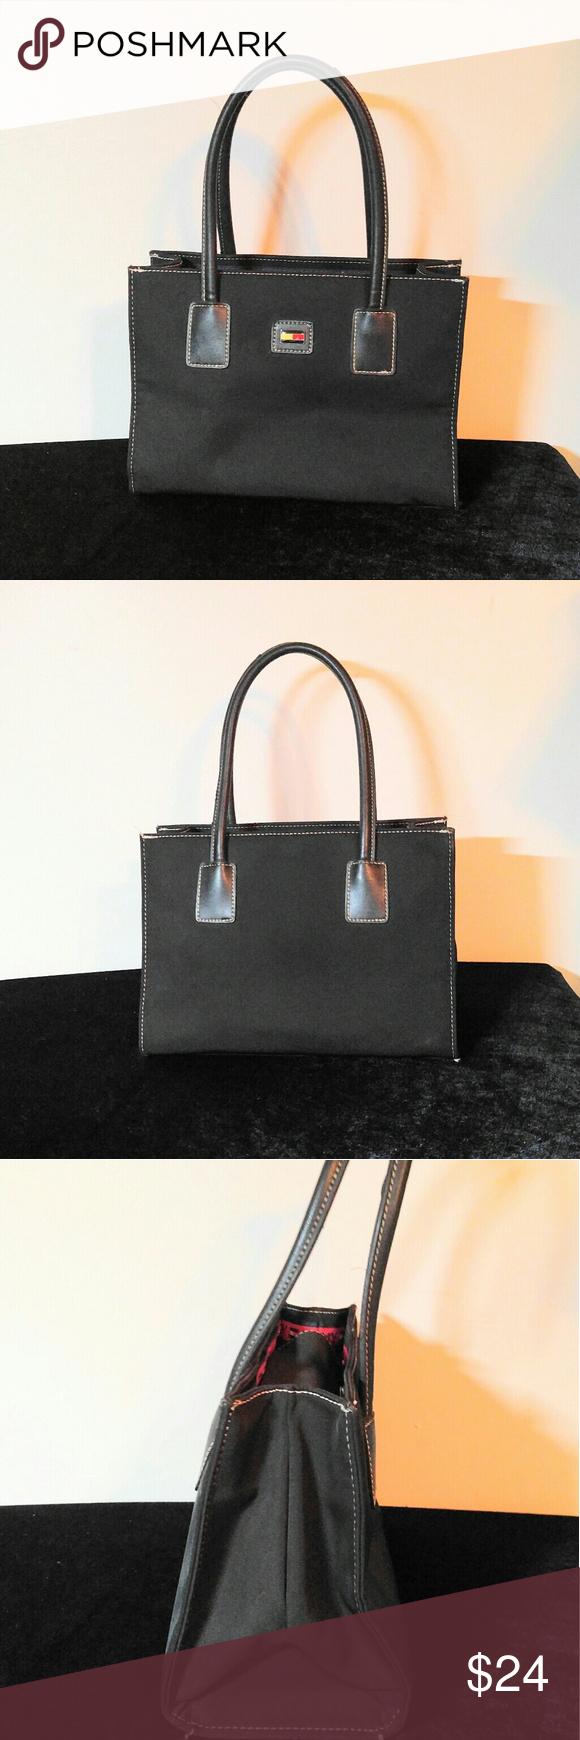 Cute Black Tommy Hilfiger Purse-LIKE NEW!! Tommy Hilfiger Purse- Like New!! 10.5 X 8 with a 7 inch drop. Tommy Hilfiger Bags